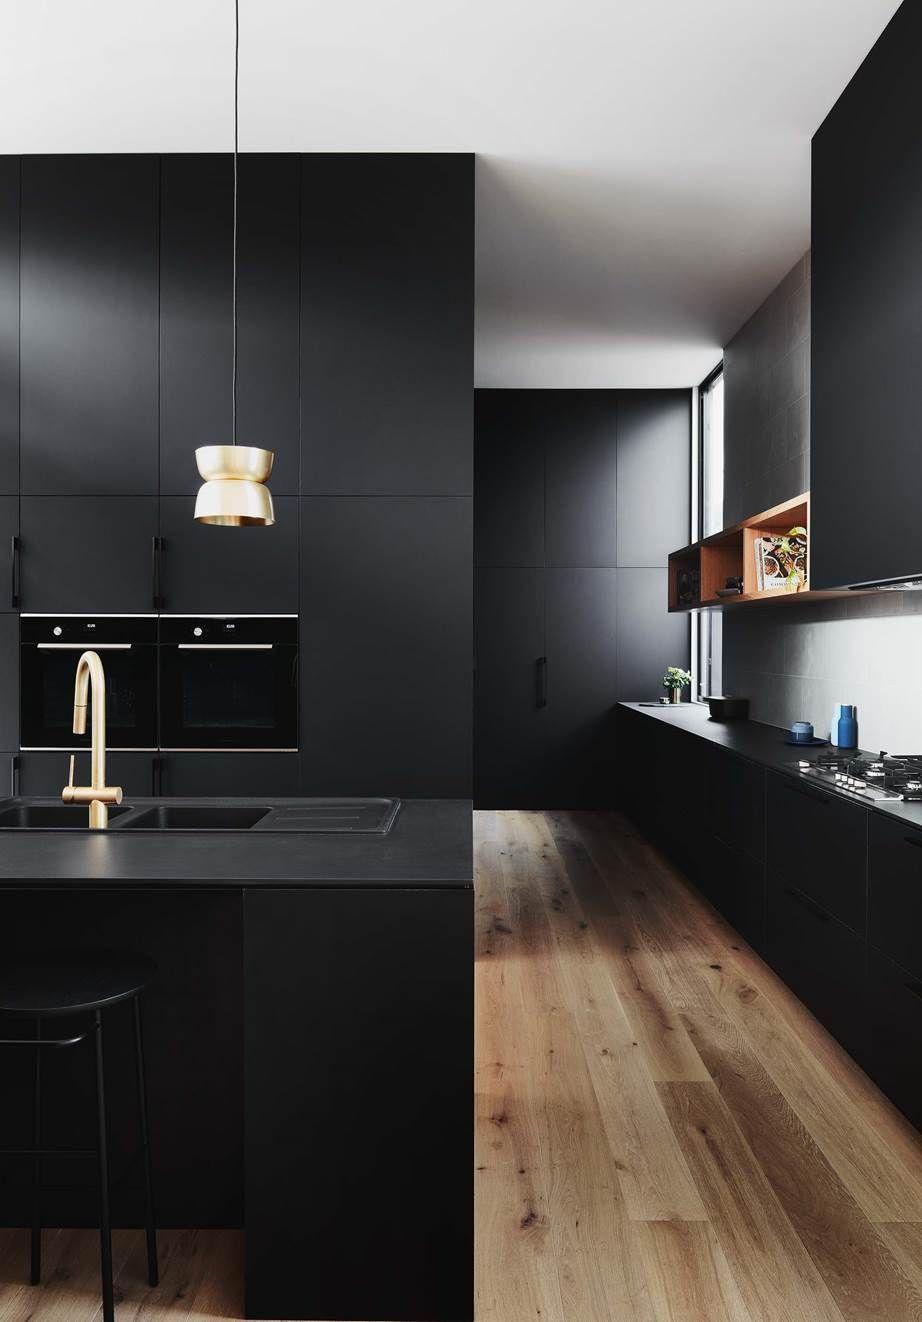 25 Luxury Kitchen And Bathroom Designs To Inspire Your Next Renovation Kitchen Interior Interior Design Kitchen House And Home Magazine